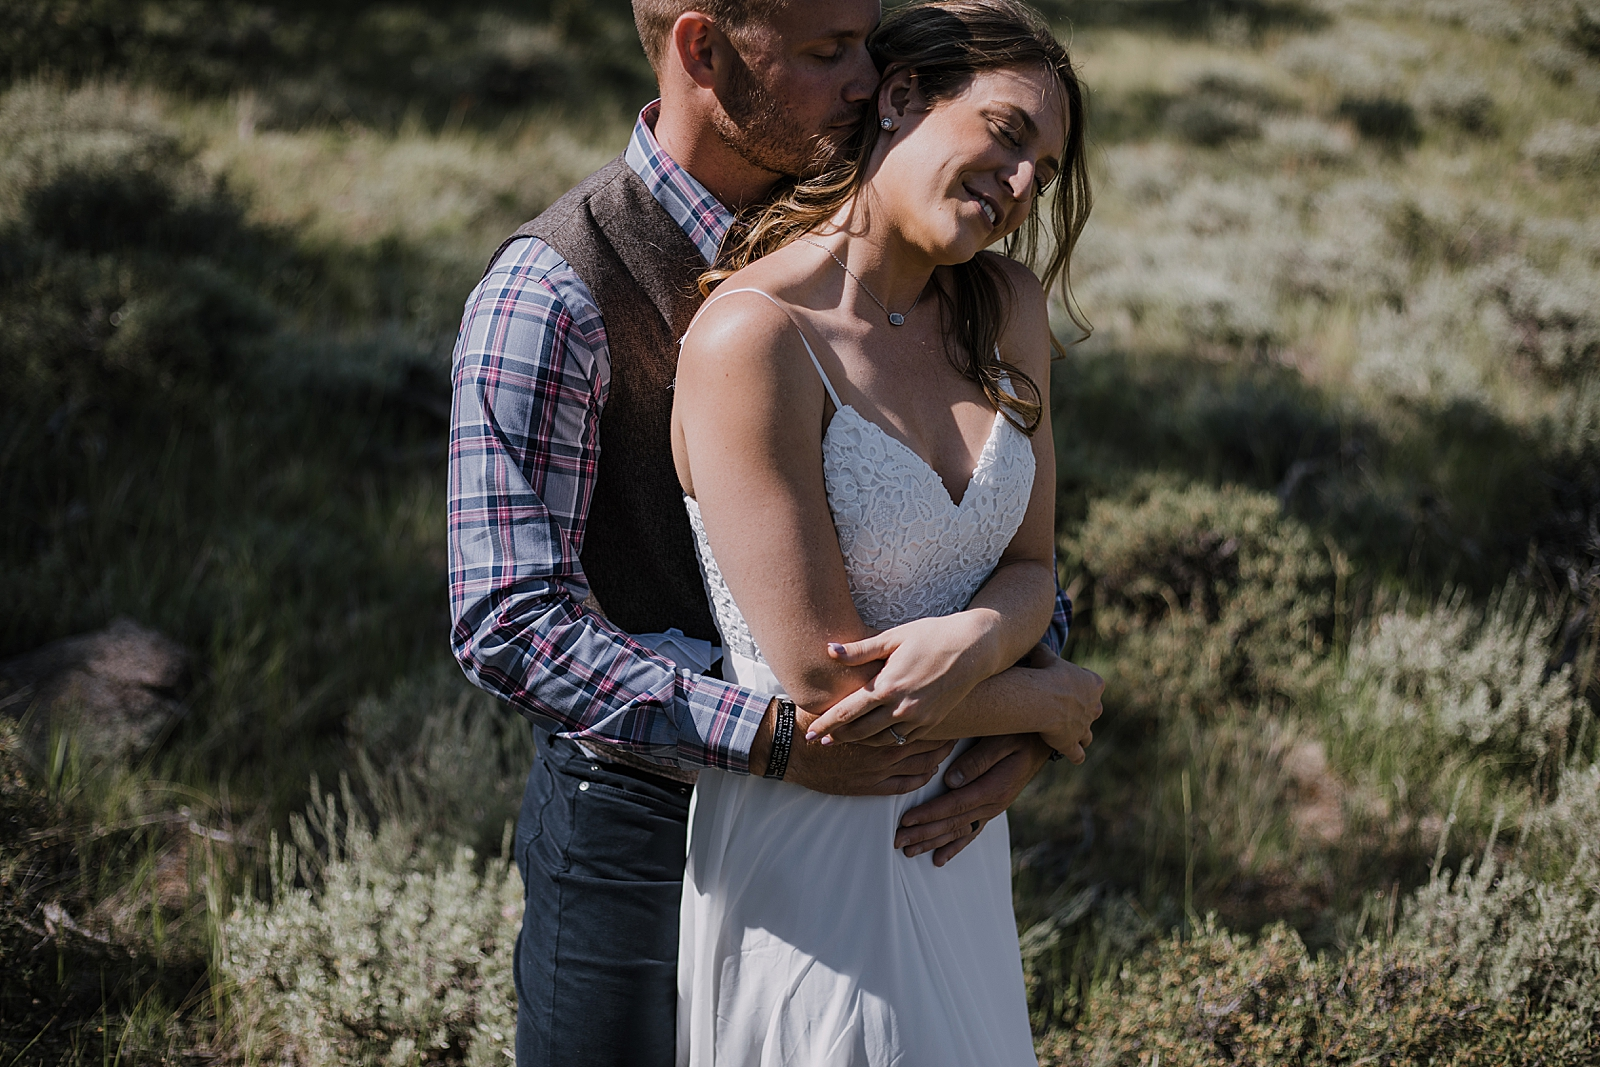 groom kissing bride, RMNP elopement ceremony, rocky mountain national park elopement, 3M curves elopement, self solemnizing, self solemnization, long's peak, summer elopement, estes park elopement